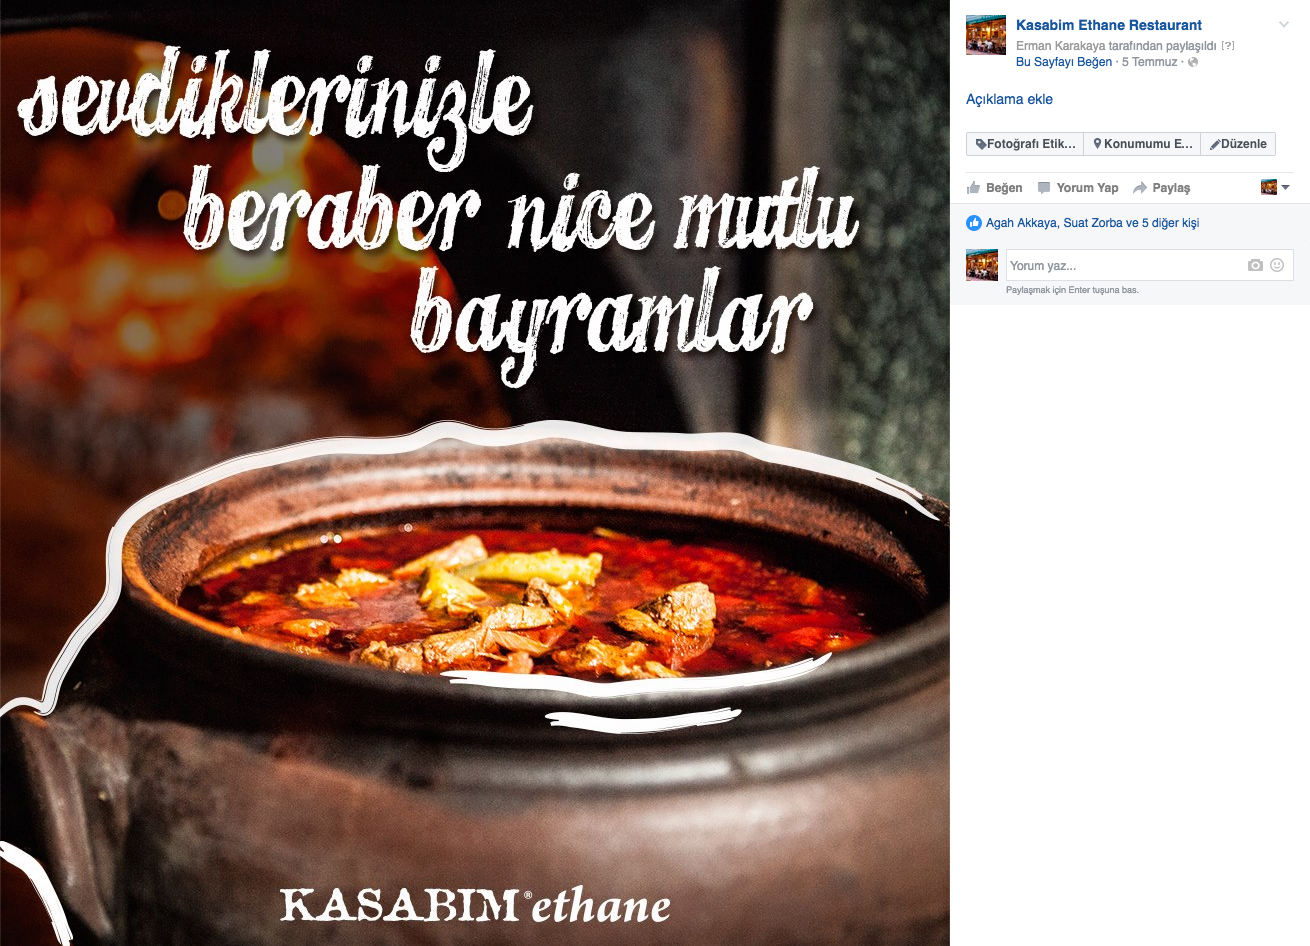 kasabim_facebook_3_-ramazan_bayrami